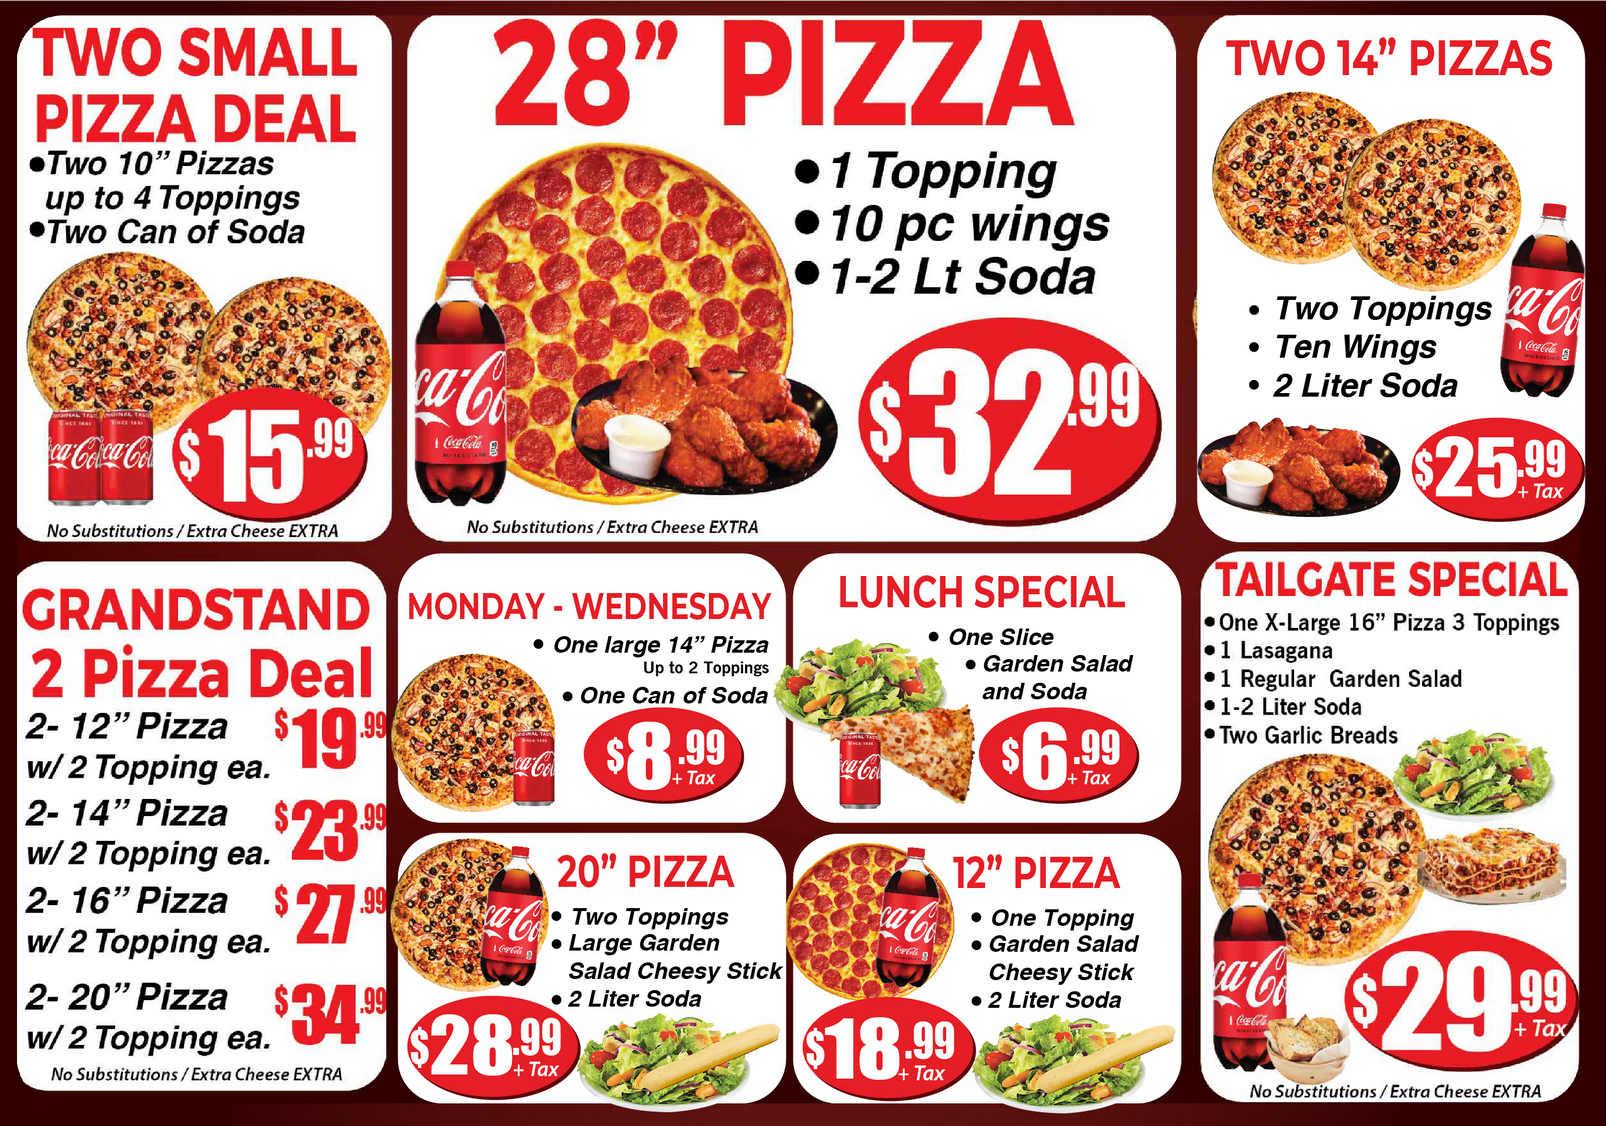 Grands Stand Pizza Specials